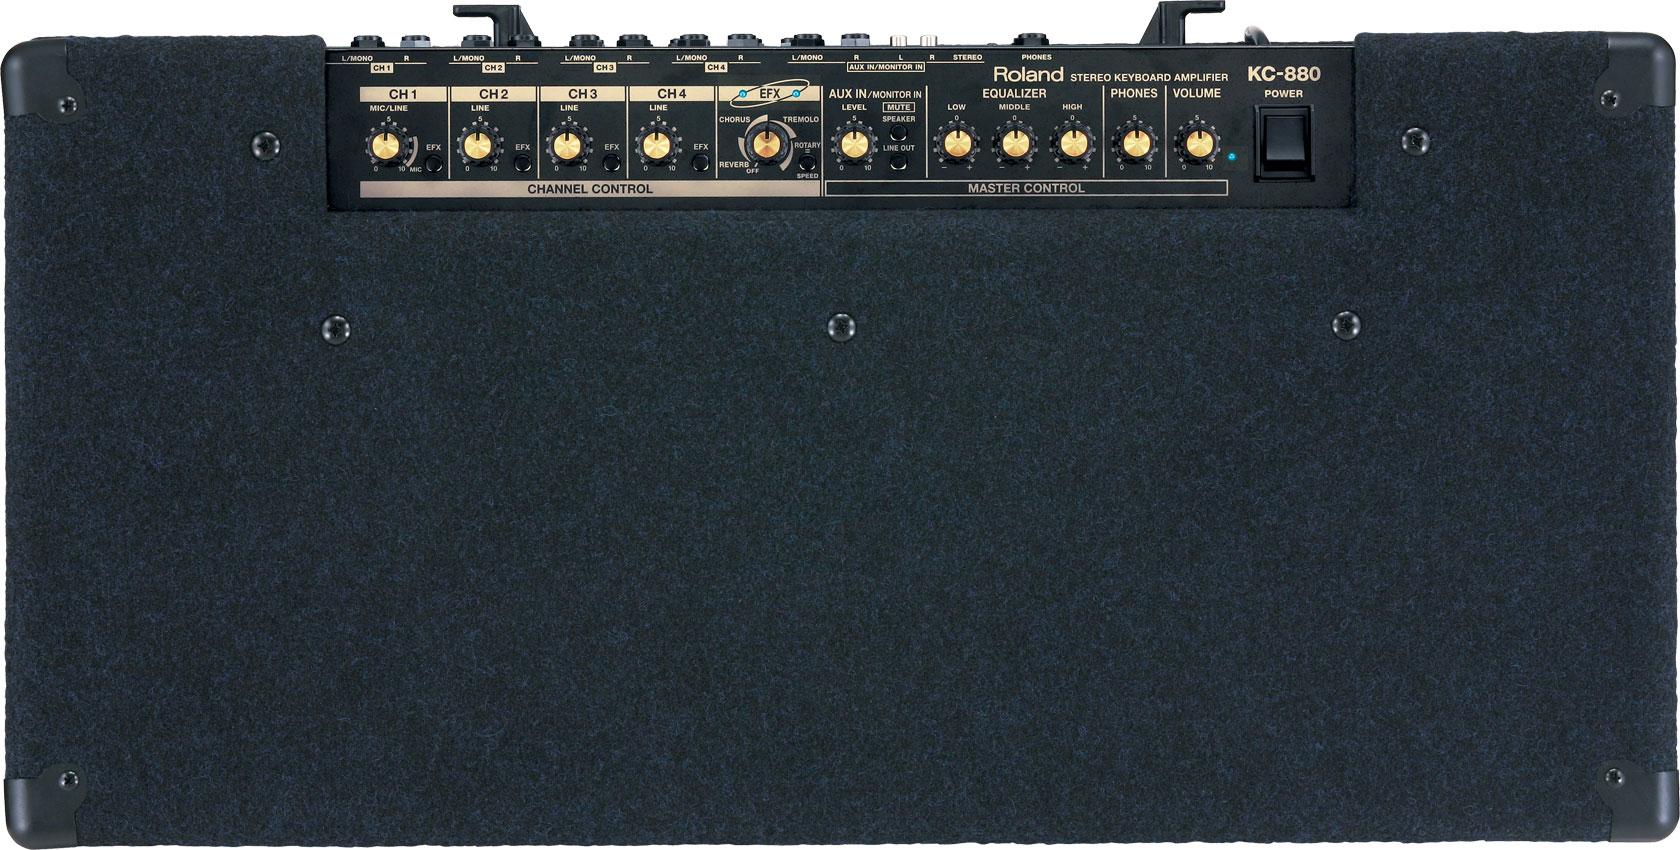 roland kc 880 stereo mixing keyboard amplifier rh roland com Roland KC- 110 Roland KC- 550